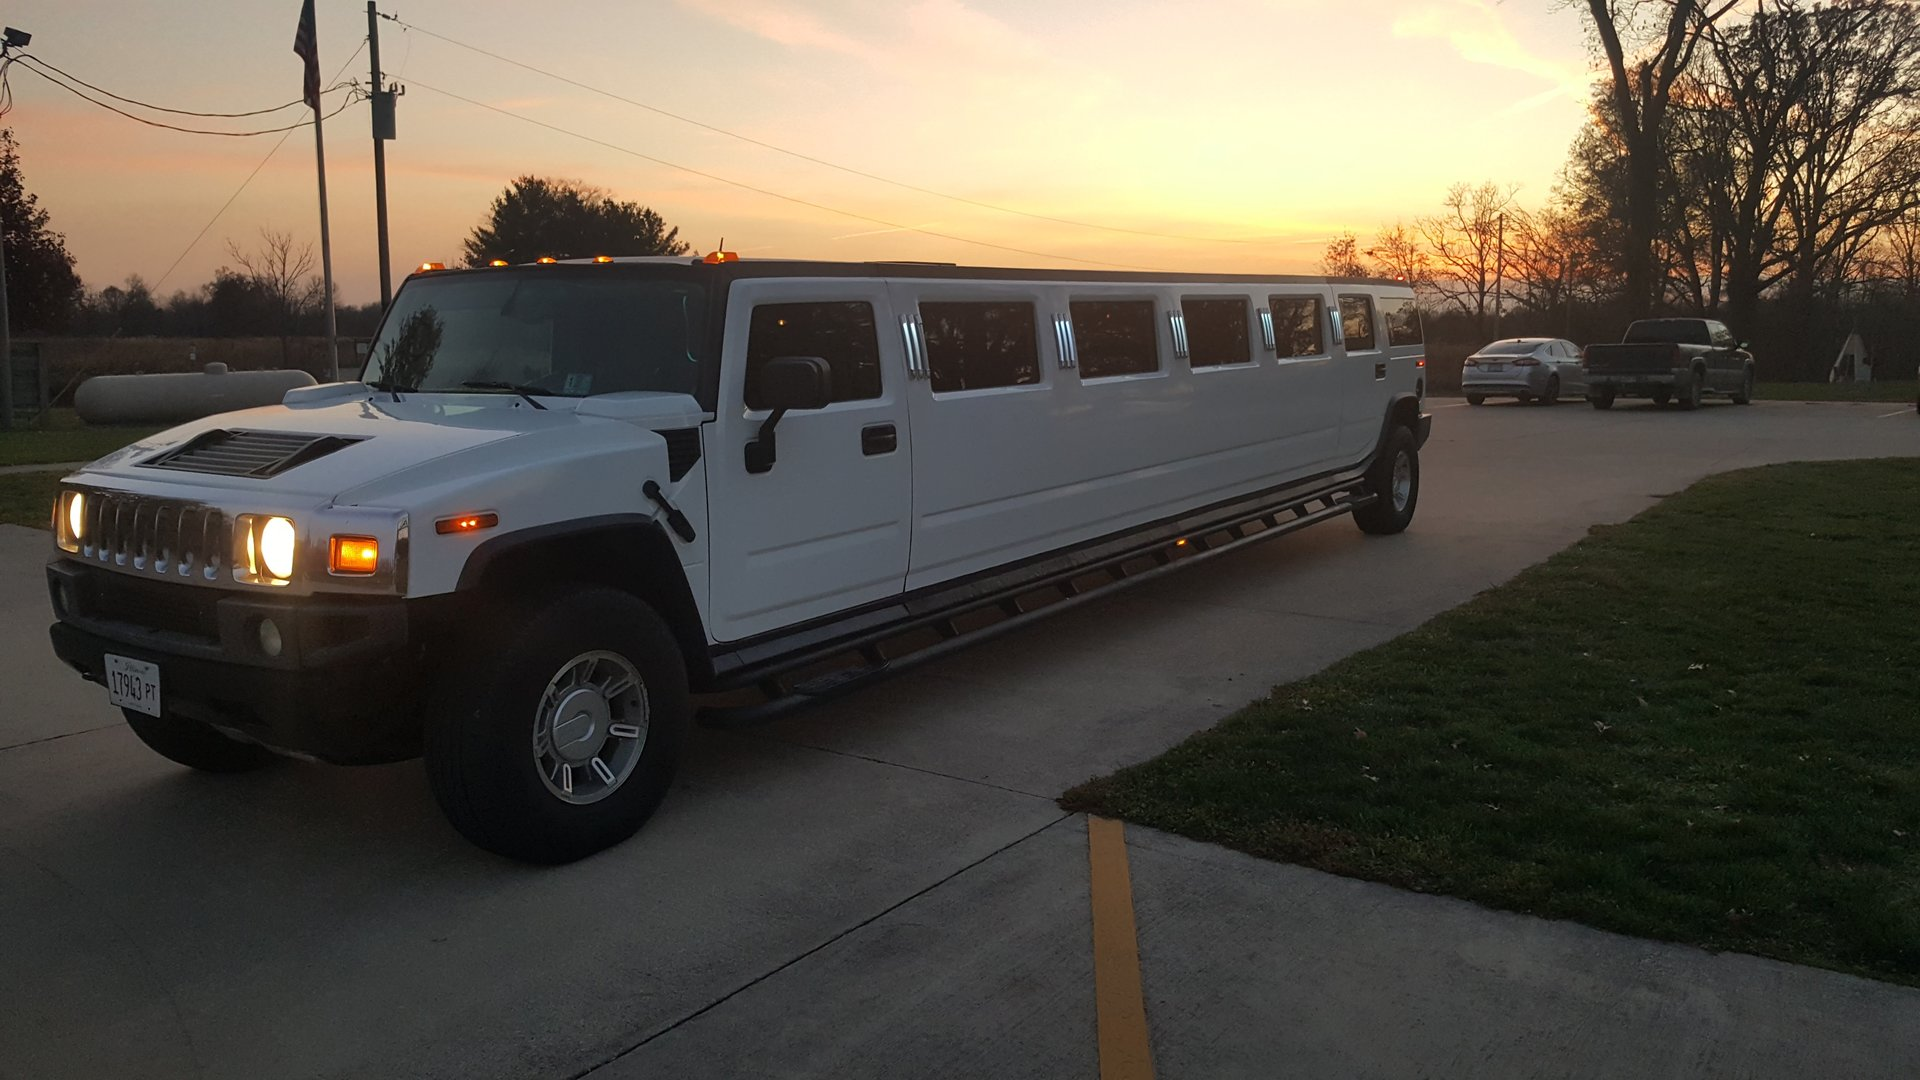 Limousine Services Hummer Limo Services